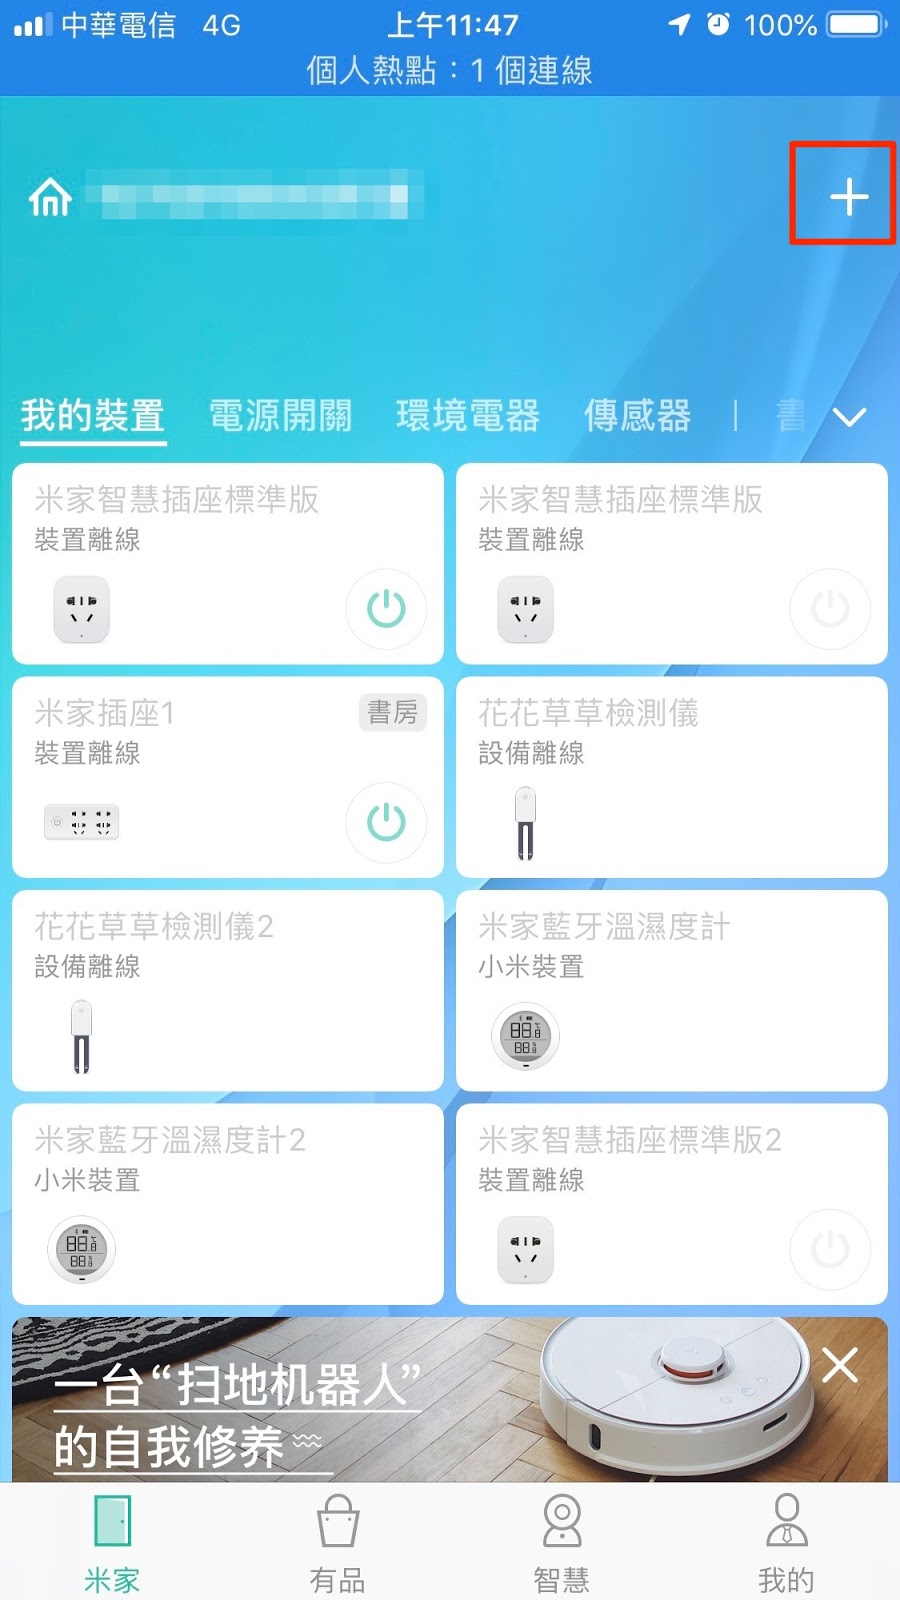 Home Assistant, (2) 遙控小米開關與條件式自動化(Internet of